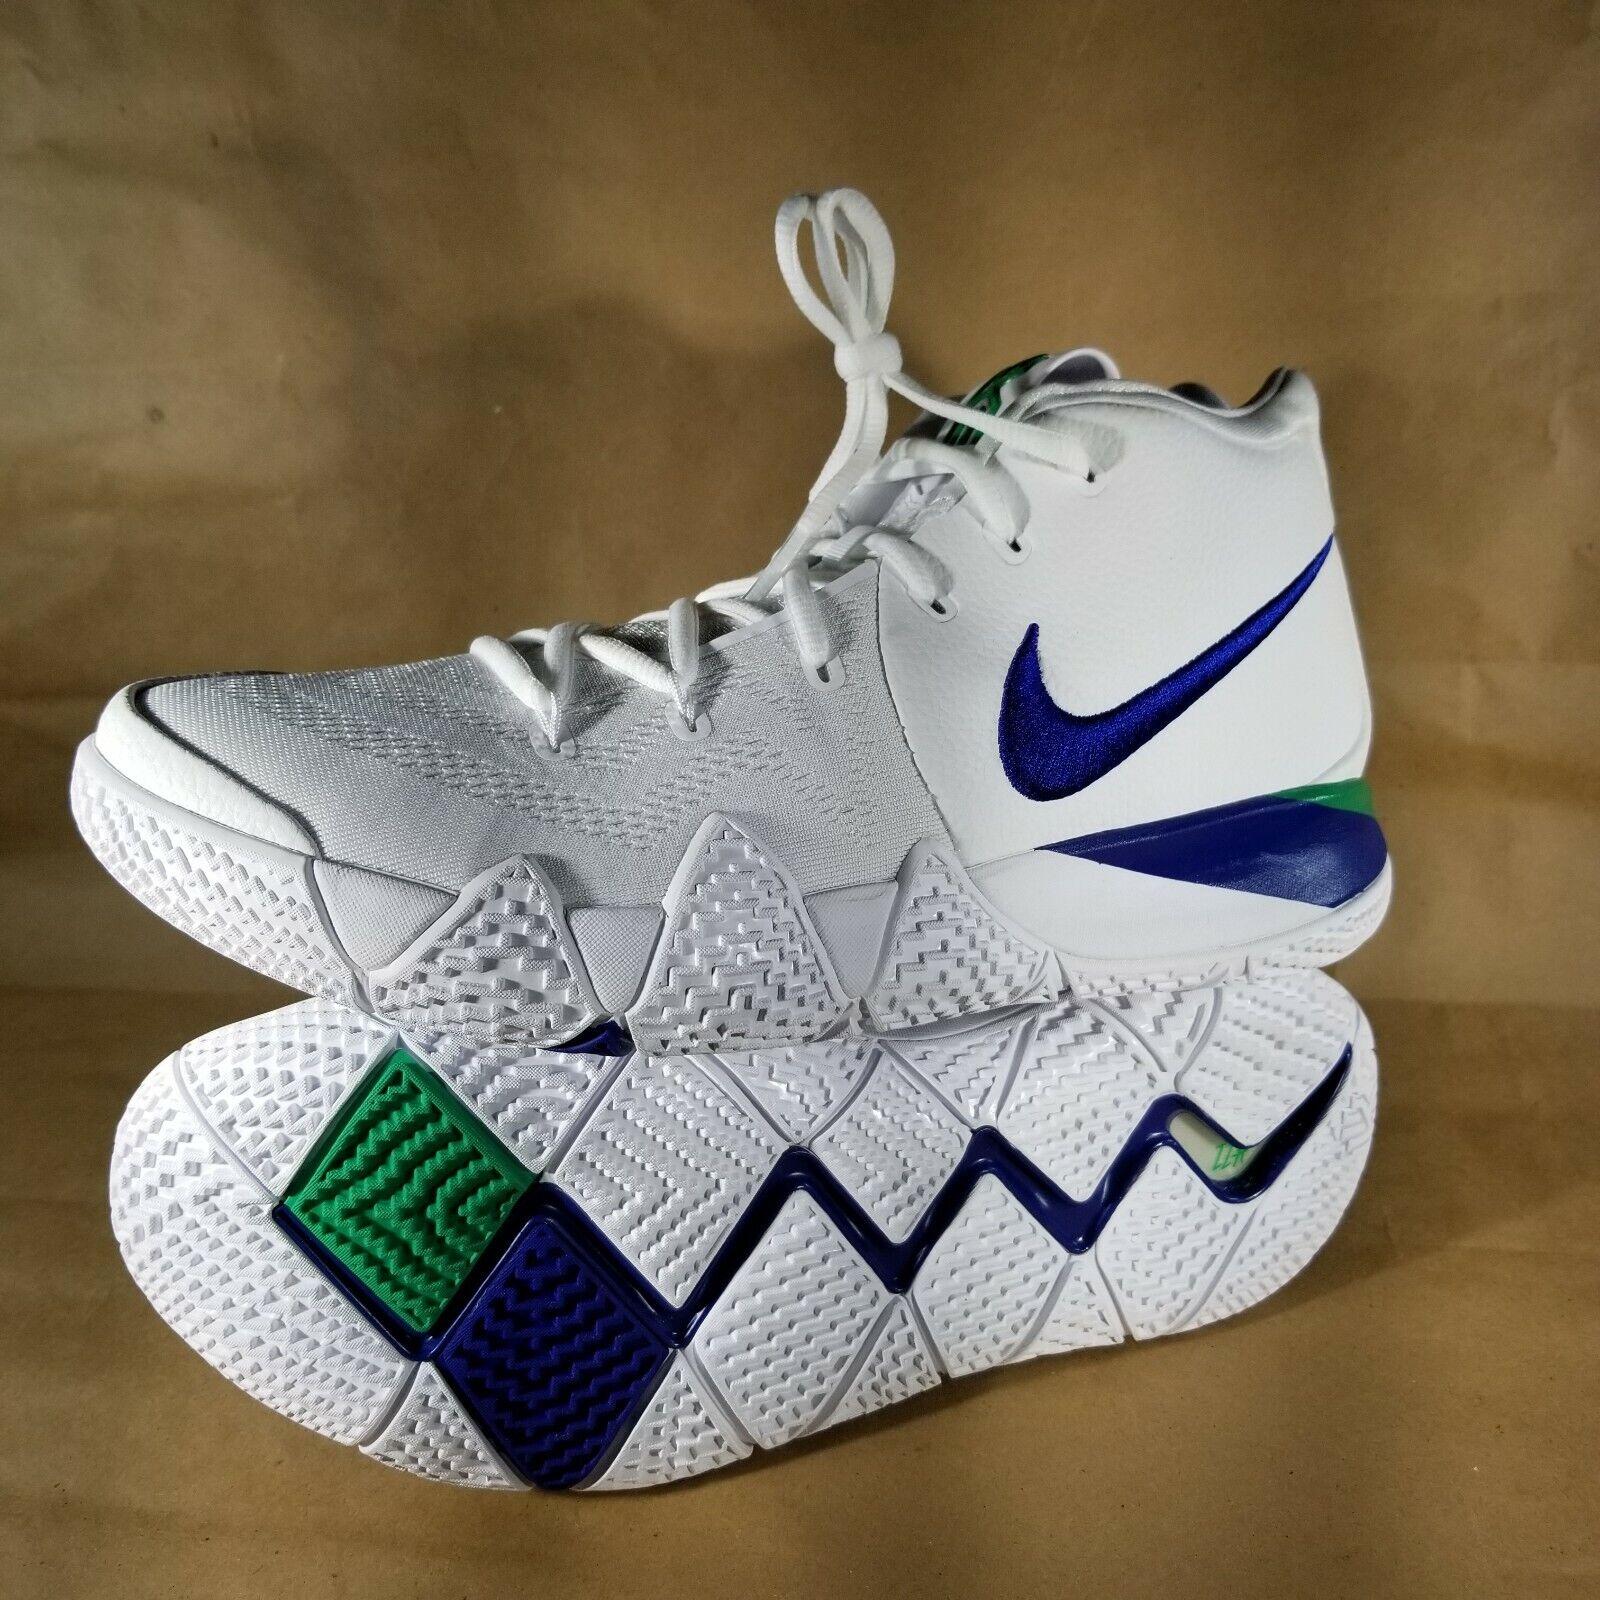 Nike Kyrie 4 Seahawks Mens 943806 -103 bianca Royal  blu Basketball Dimensione 11  acquista online